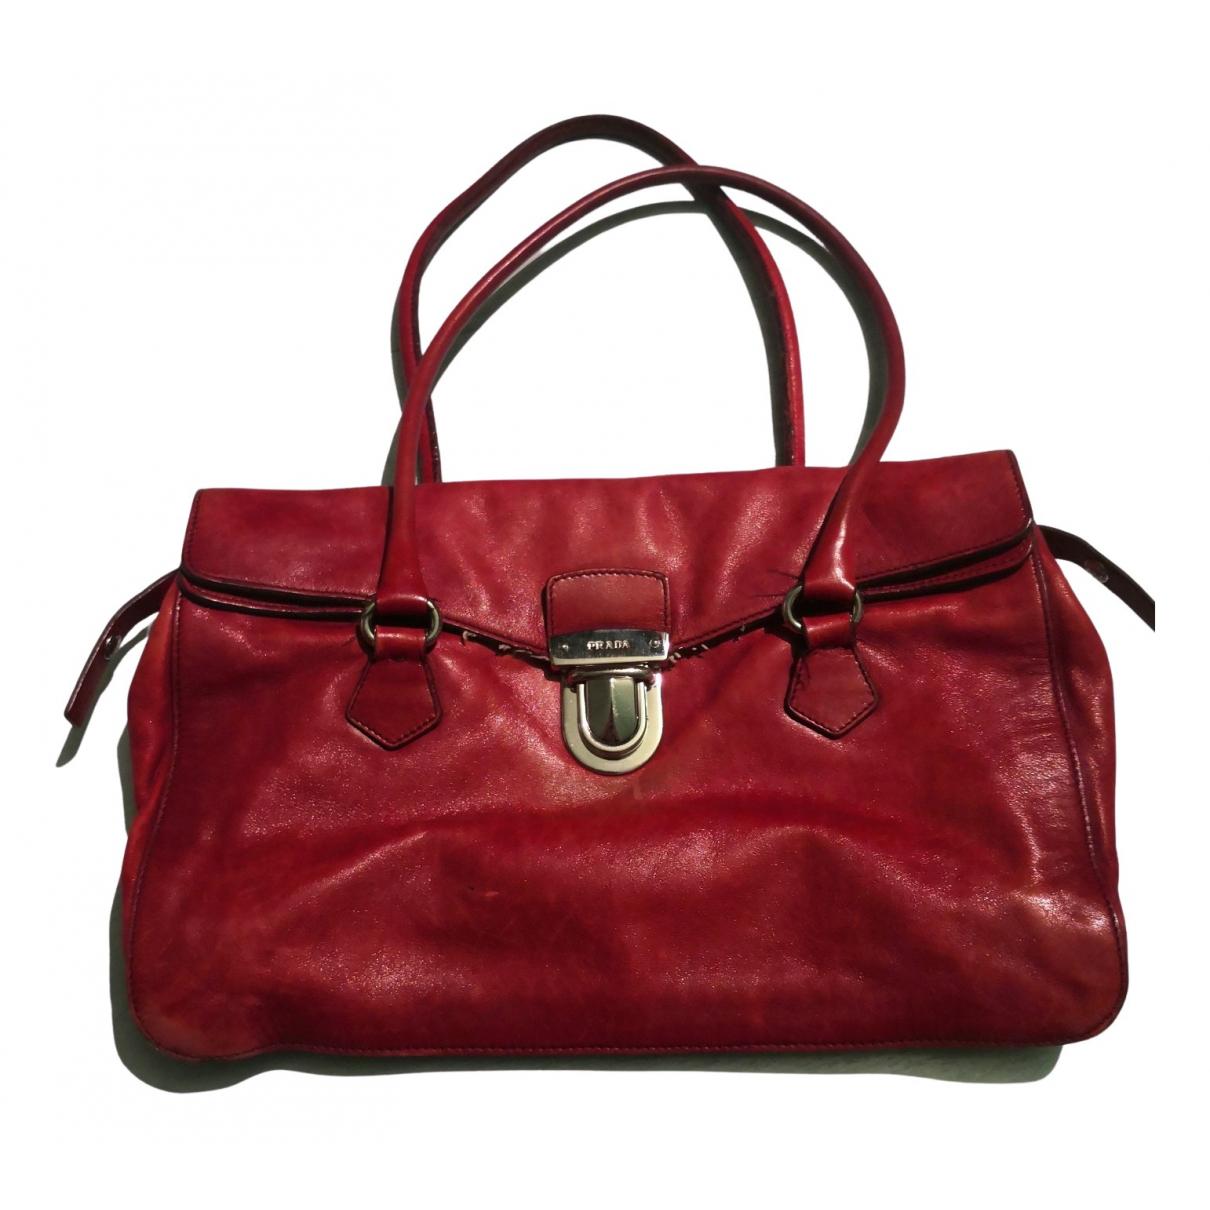 Prada \N Handtasche in  Bordeauxrot Leder